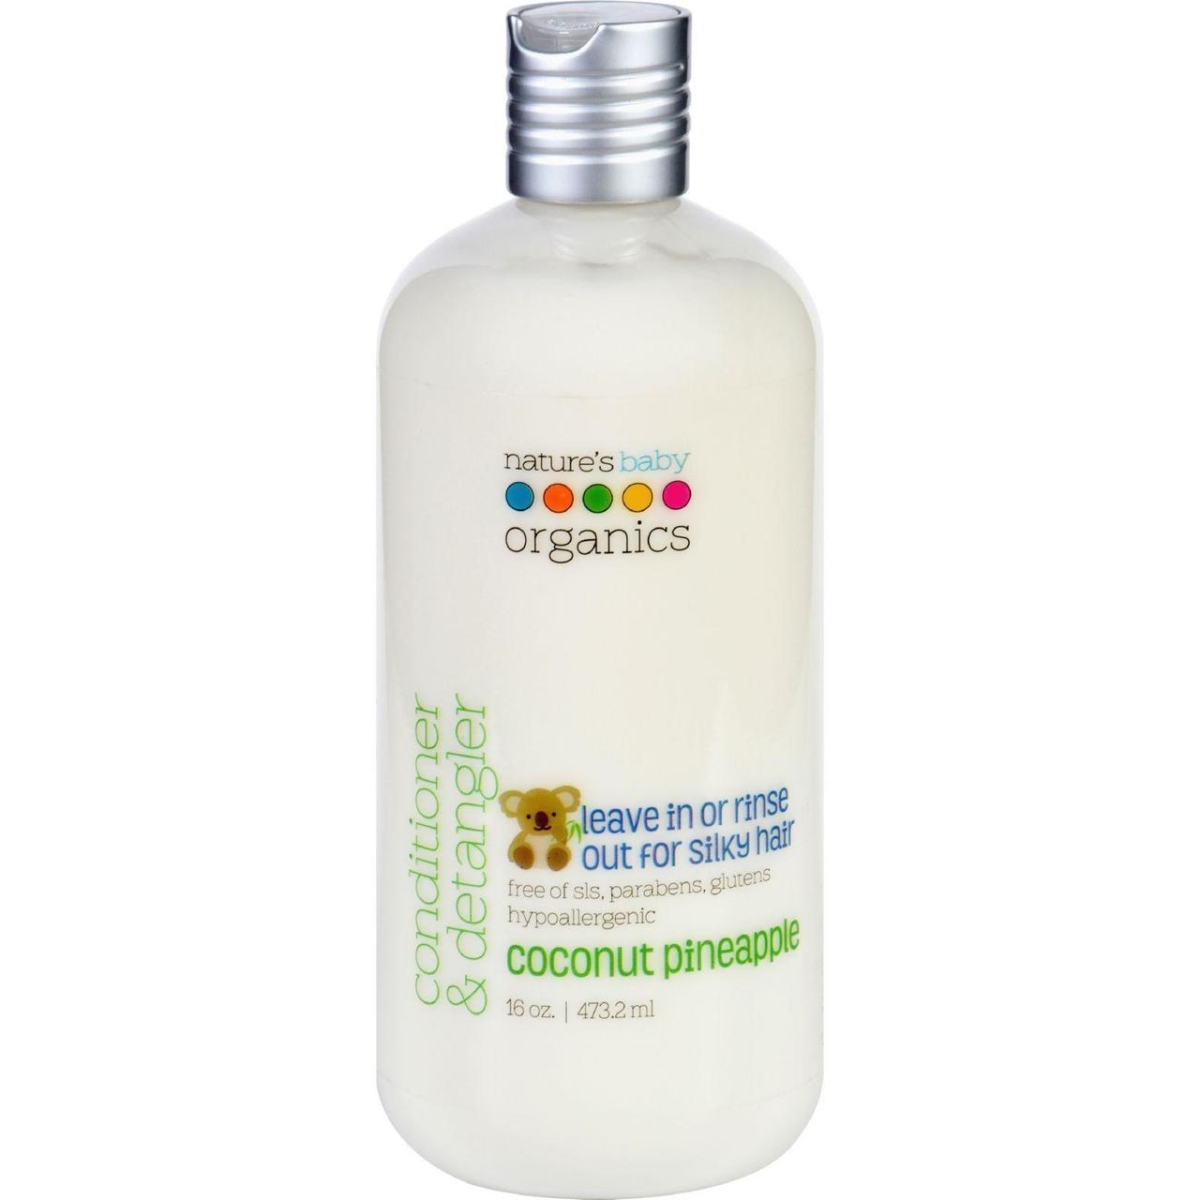 Natures Baby Organics ECW1624378 16 oz Conditioner & Detangler Coconut Pineapple